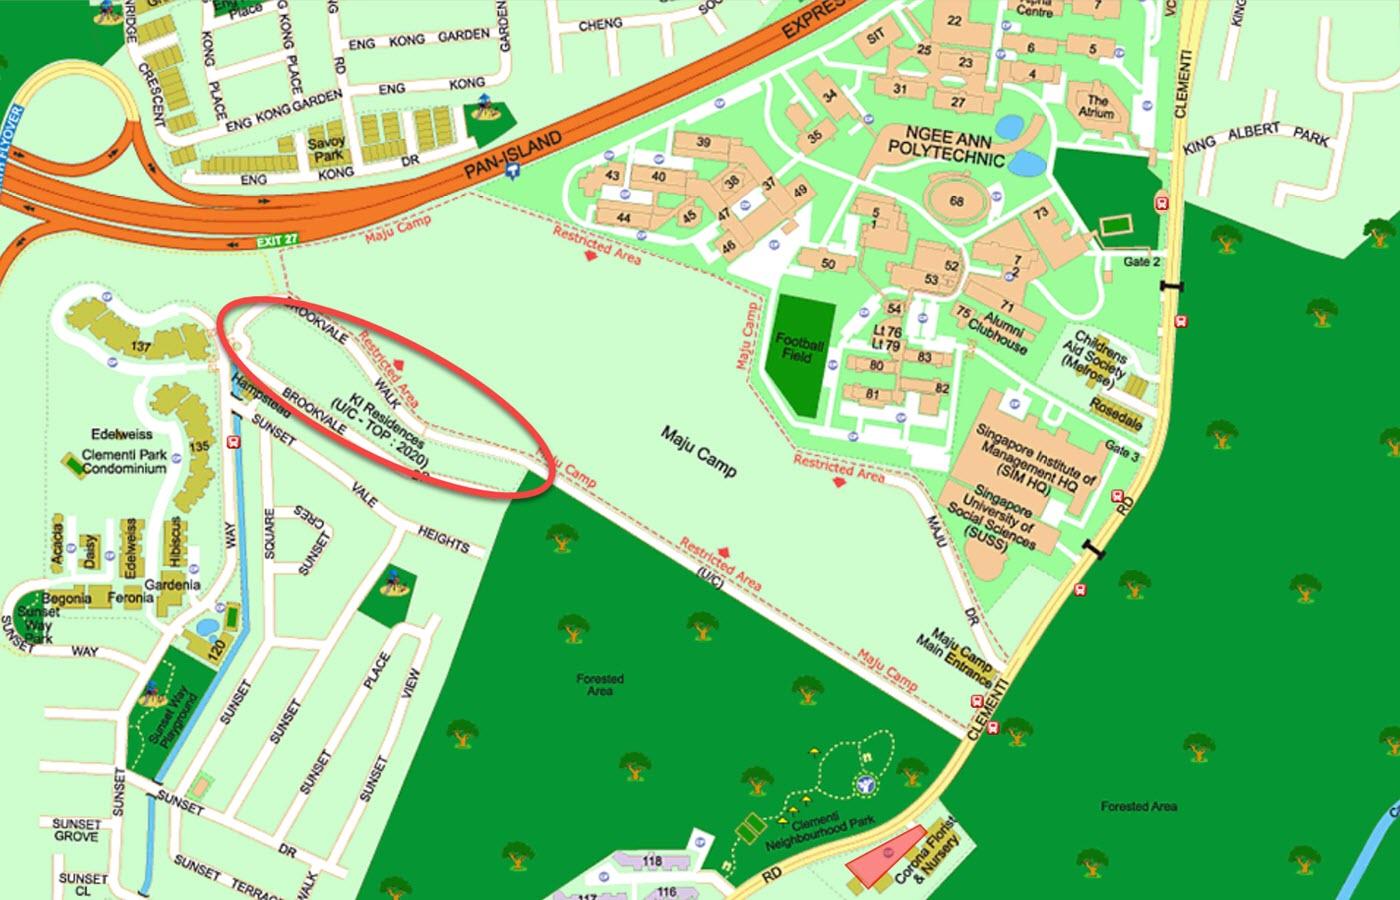 KI Residences at Brookvale Condo Location - Street Directory Map